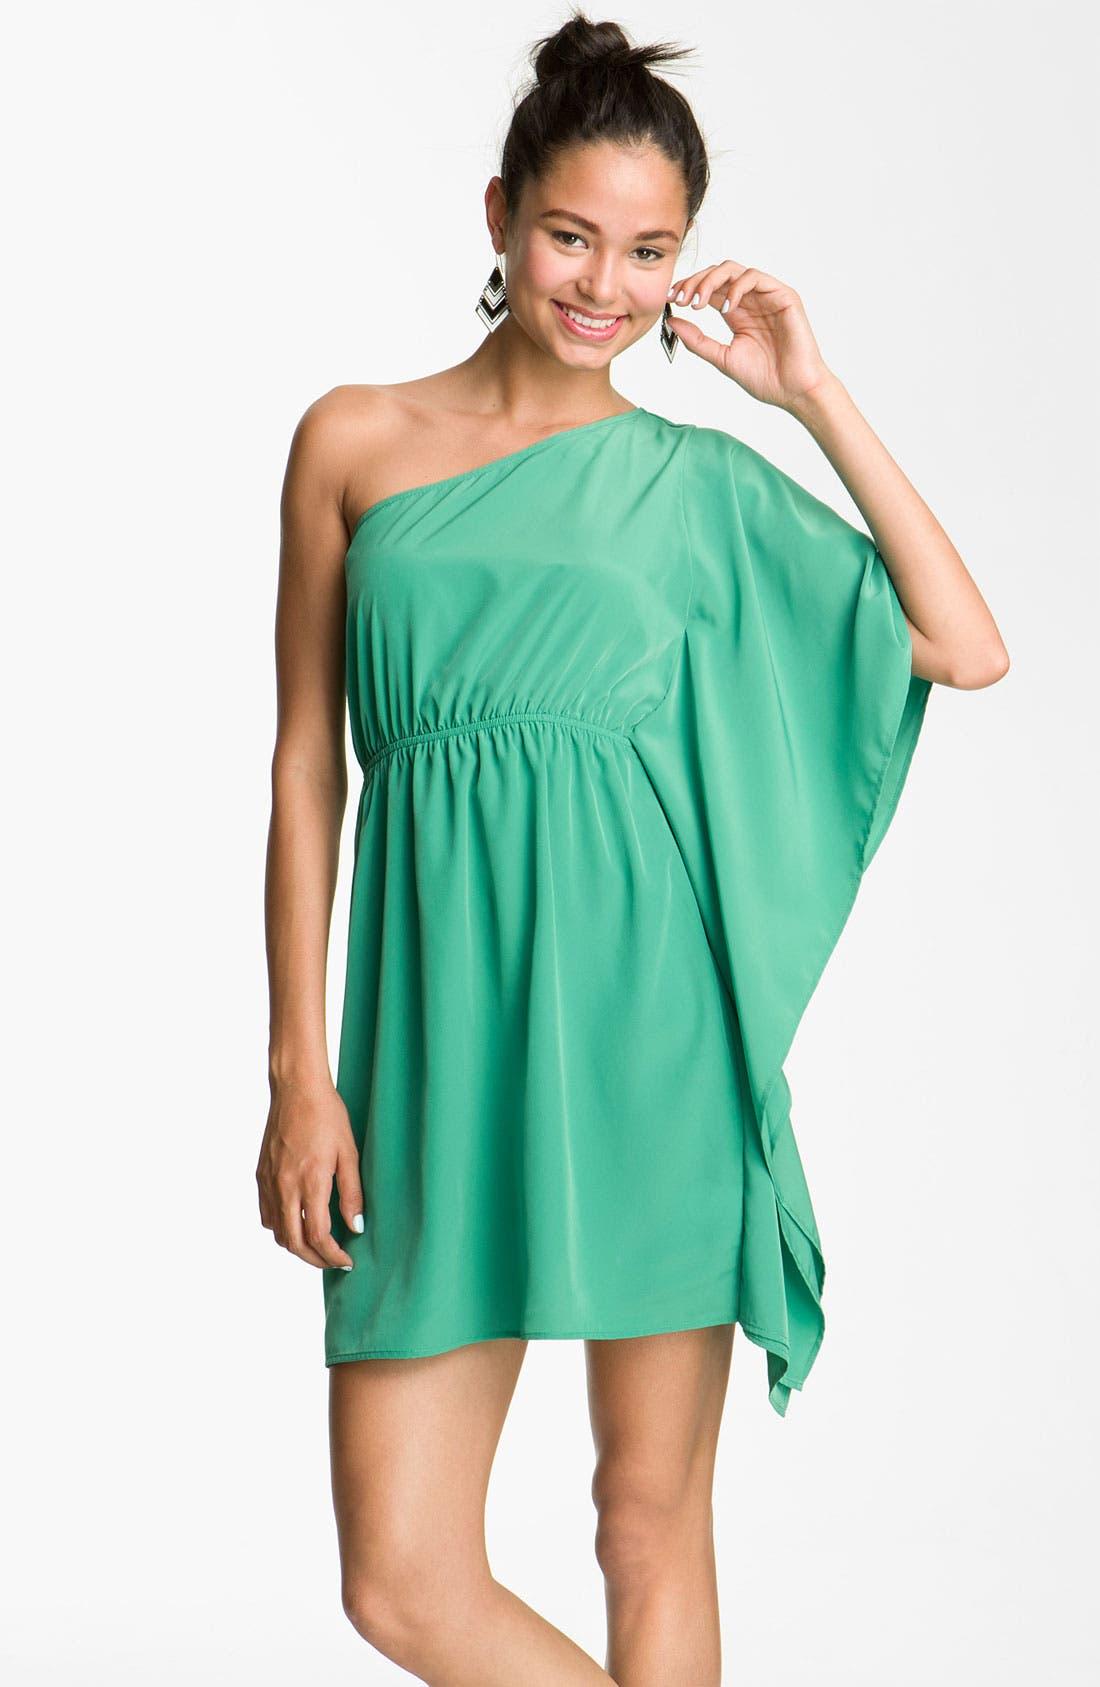 Alternate Image 1 Selected - Soprano One Shoulder Dress (Juniors)